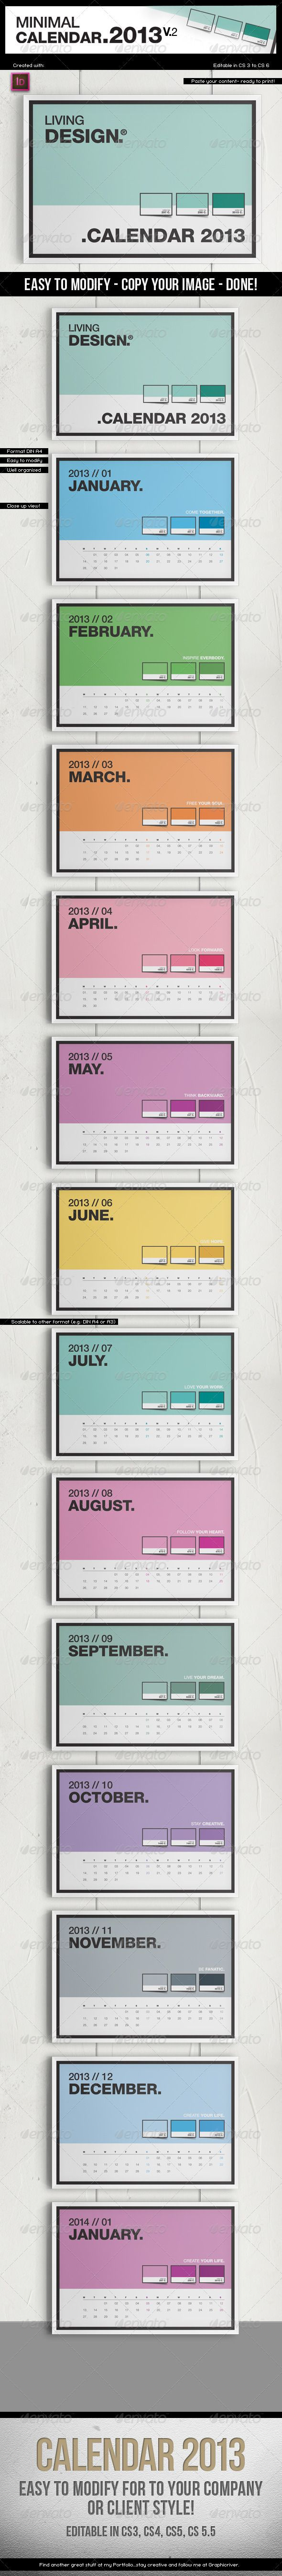 Calendar  V  A Template  Pantone  Style  Pantone